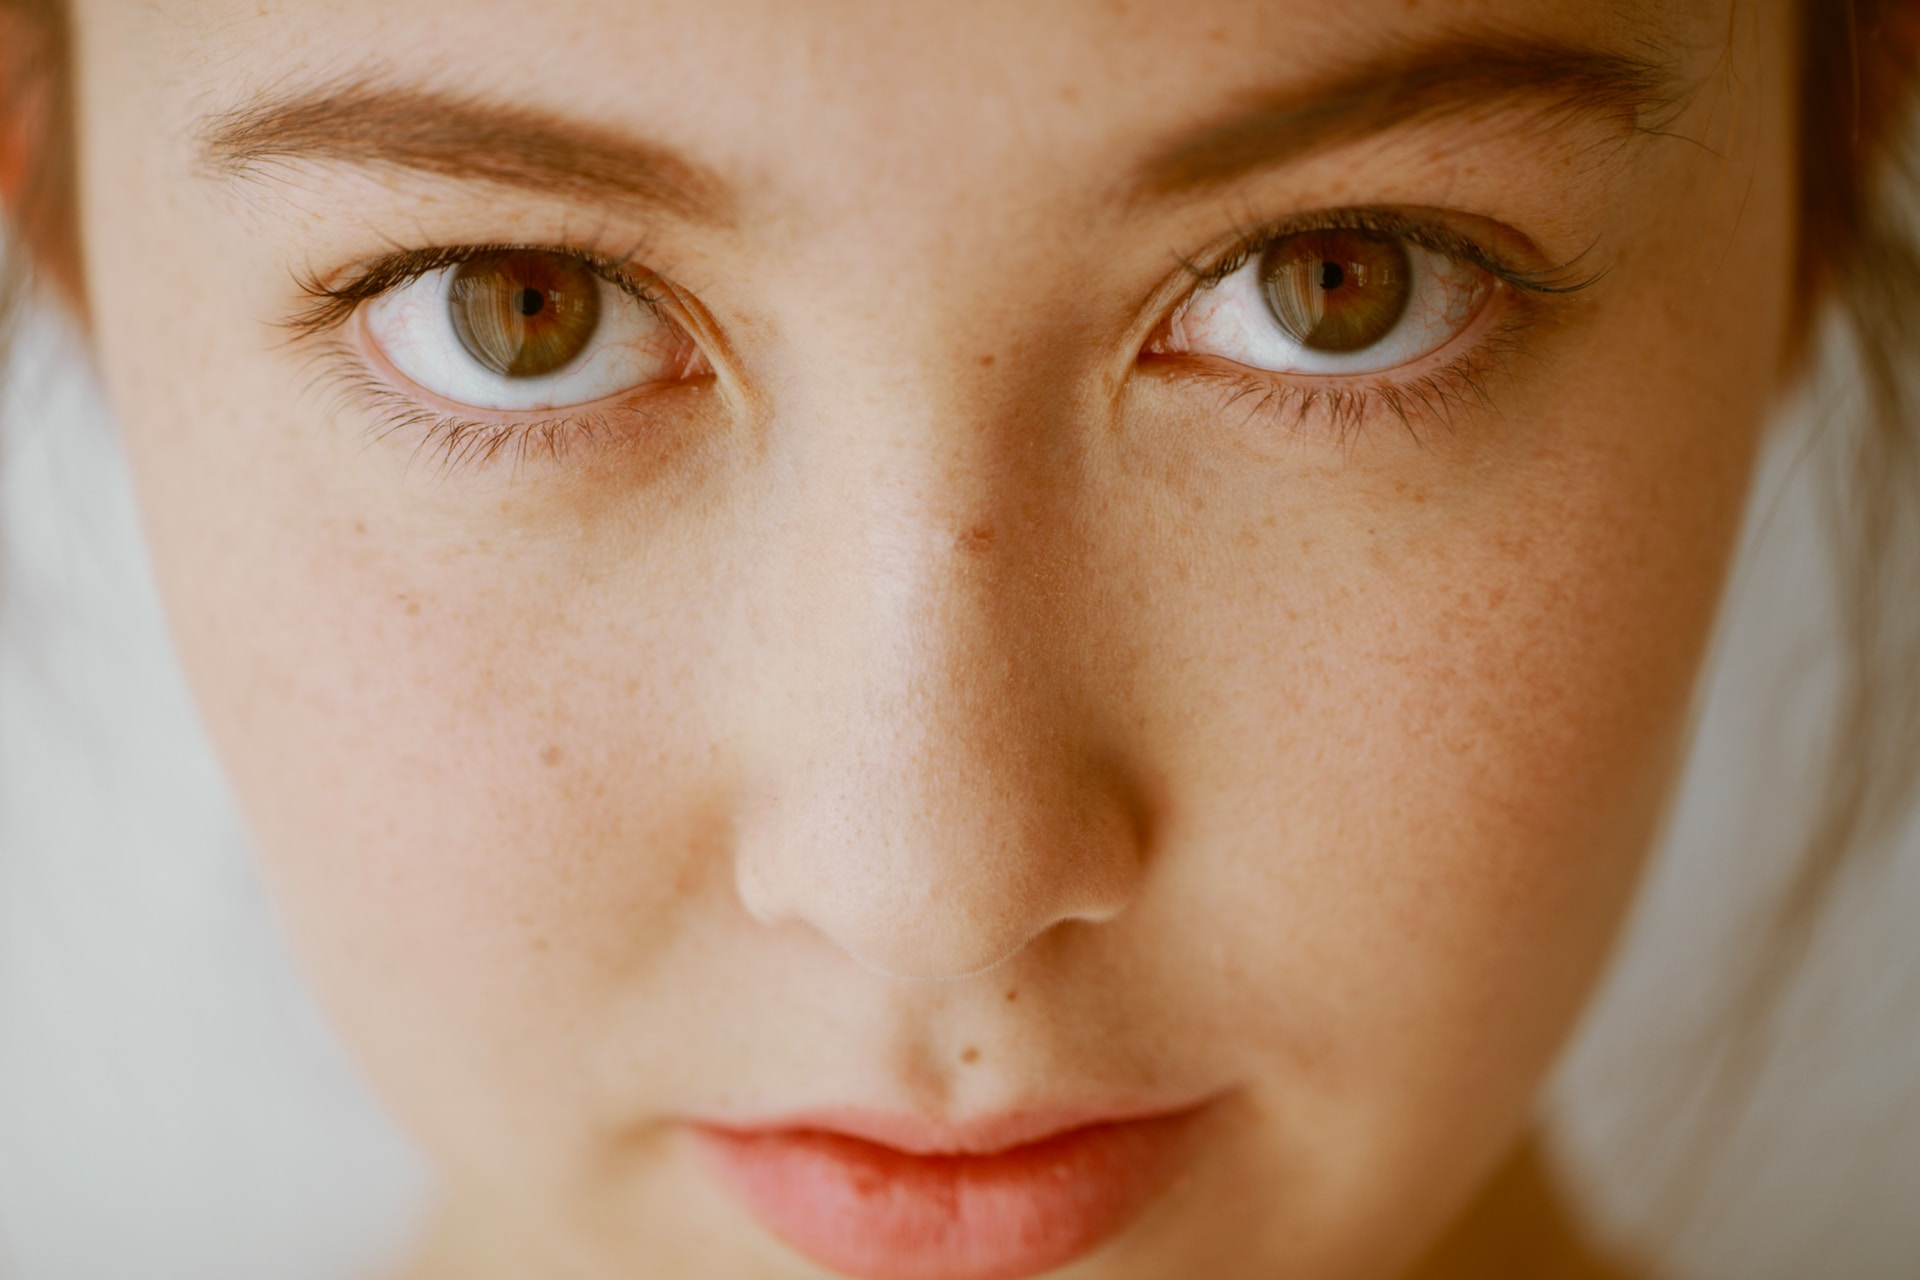 close up photo of boys face